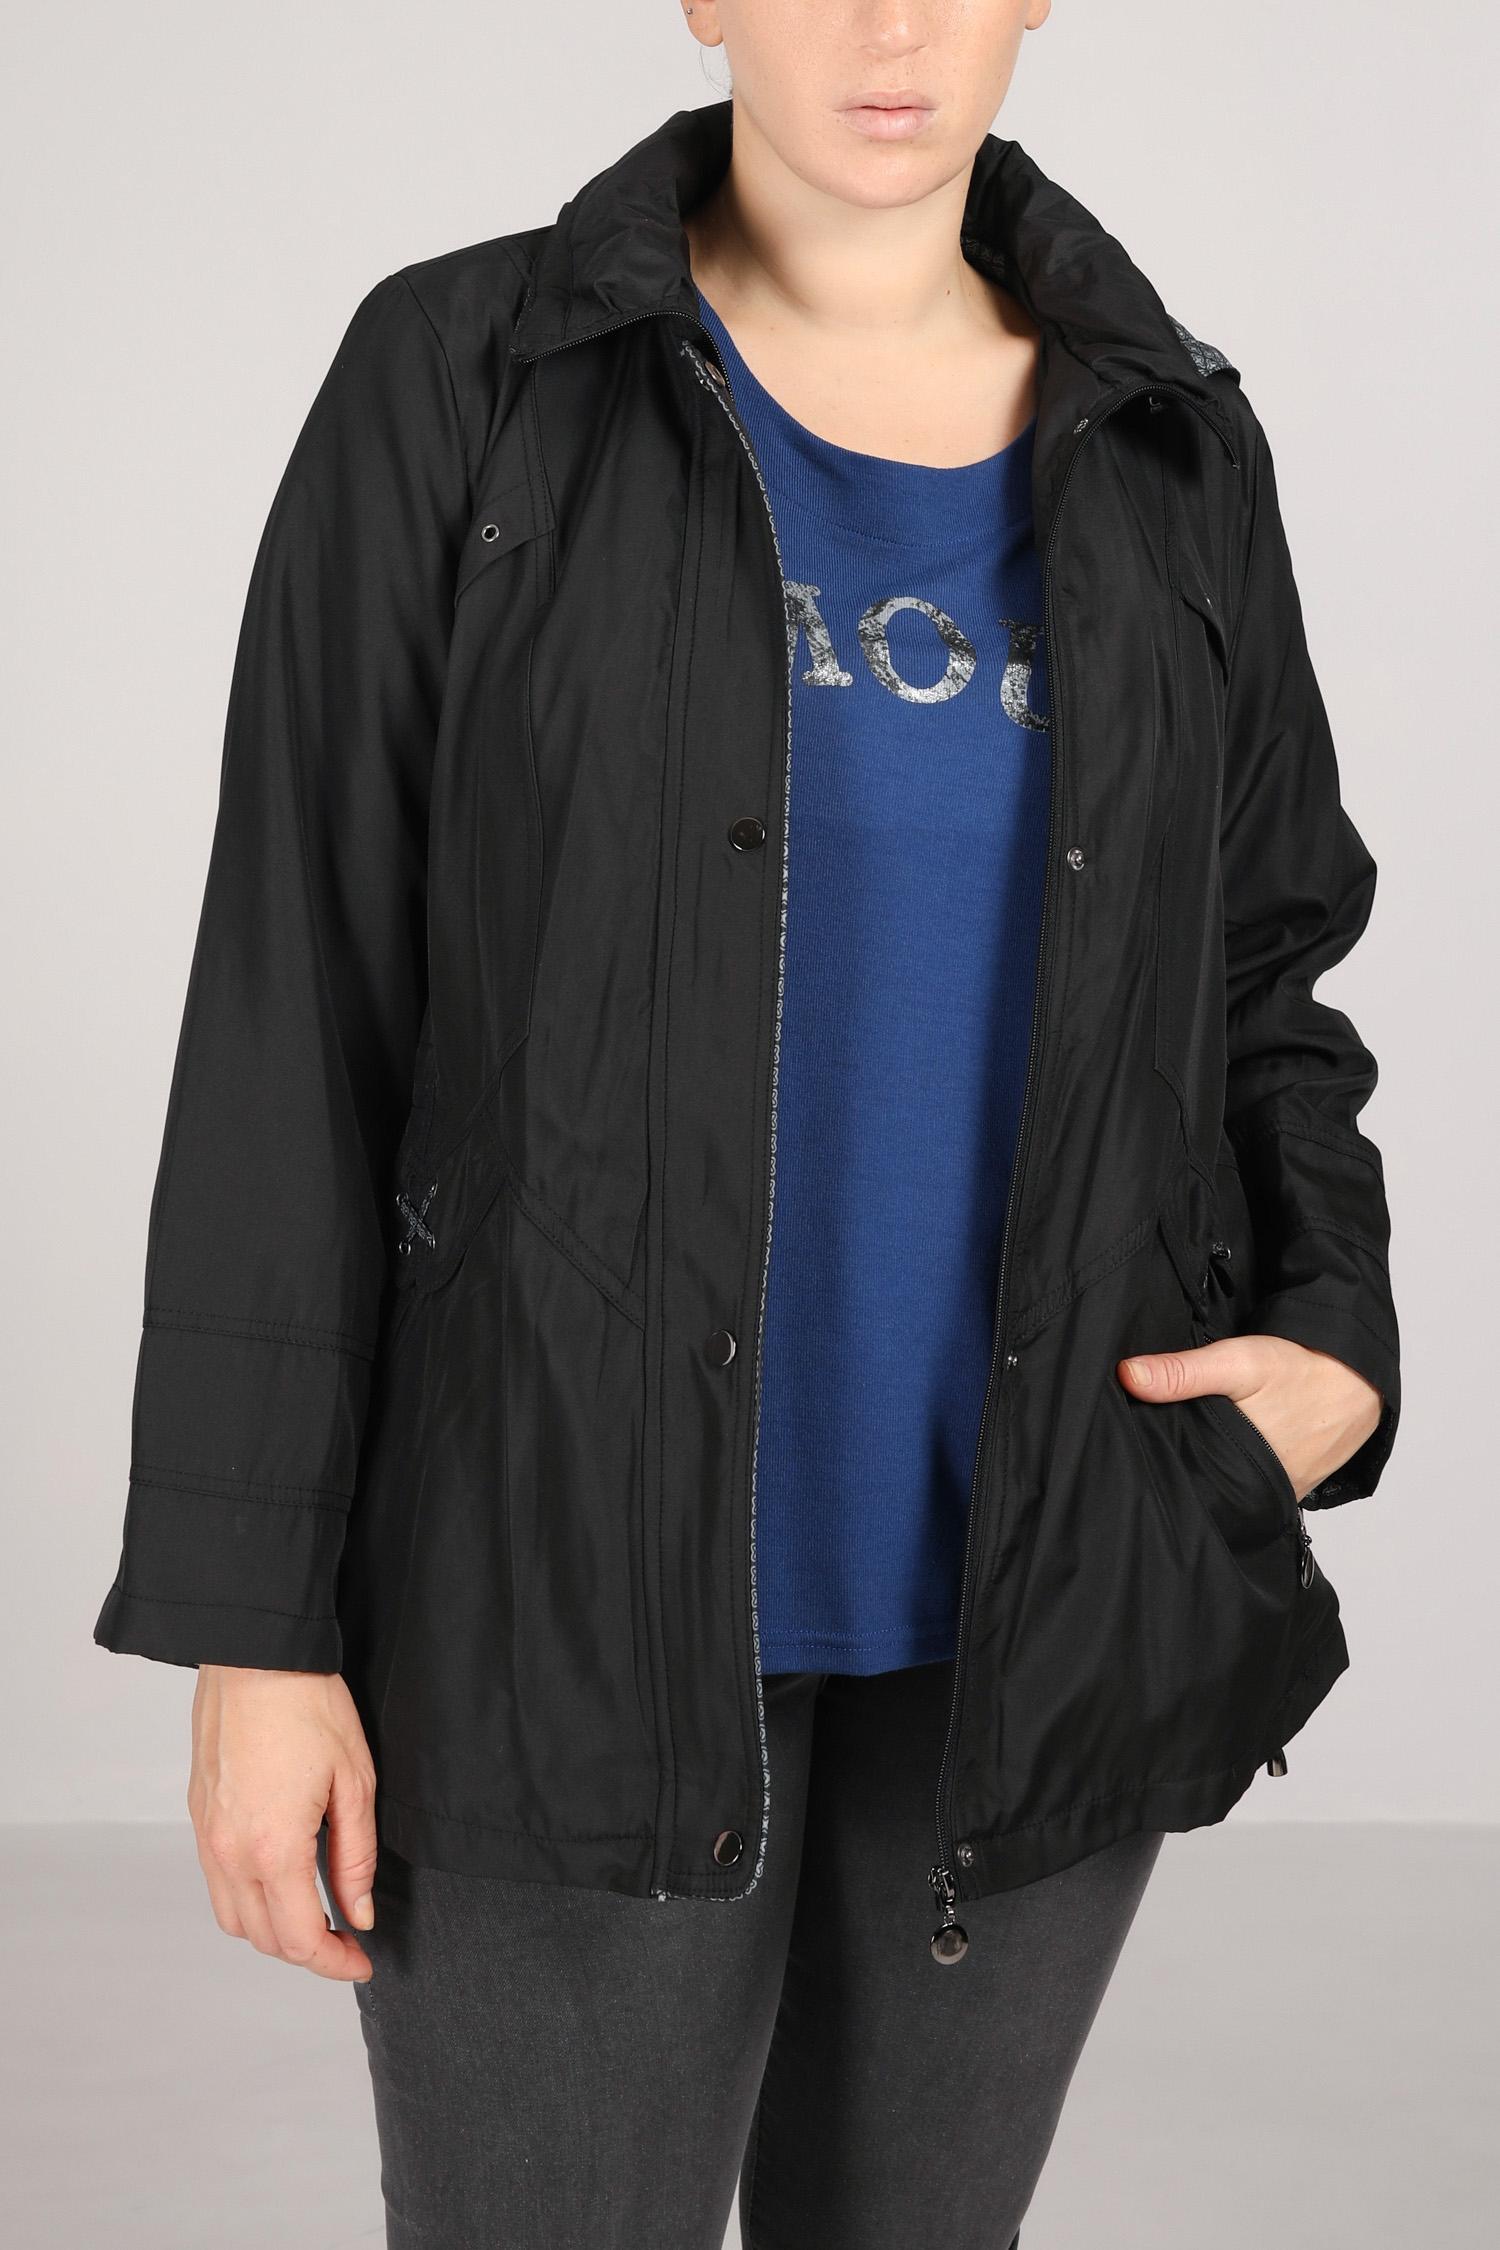 Jacket / parka doubled